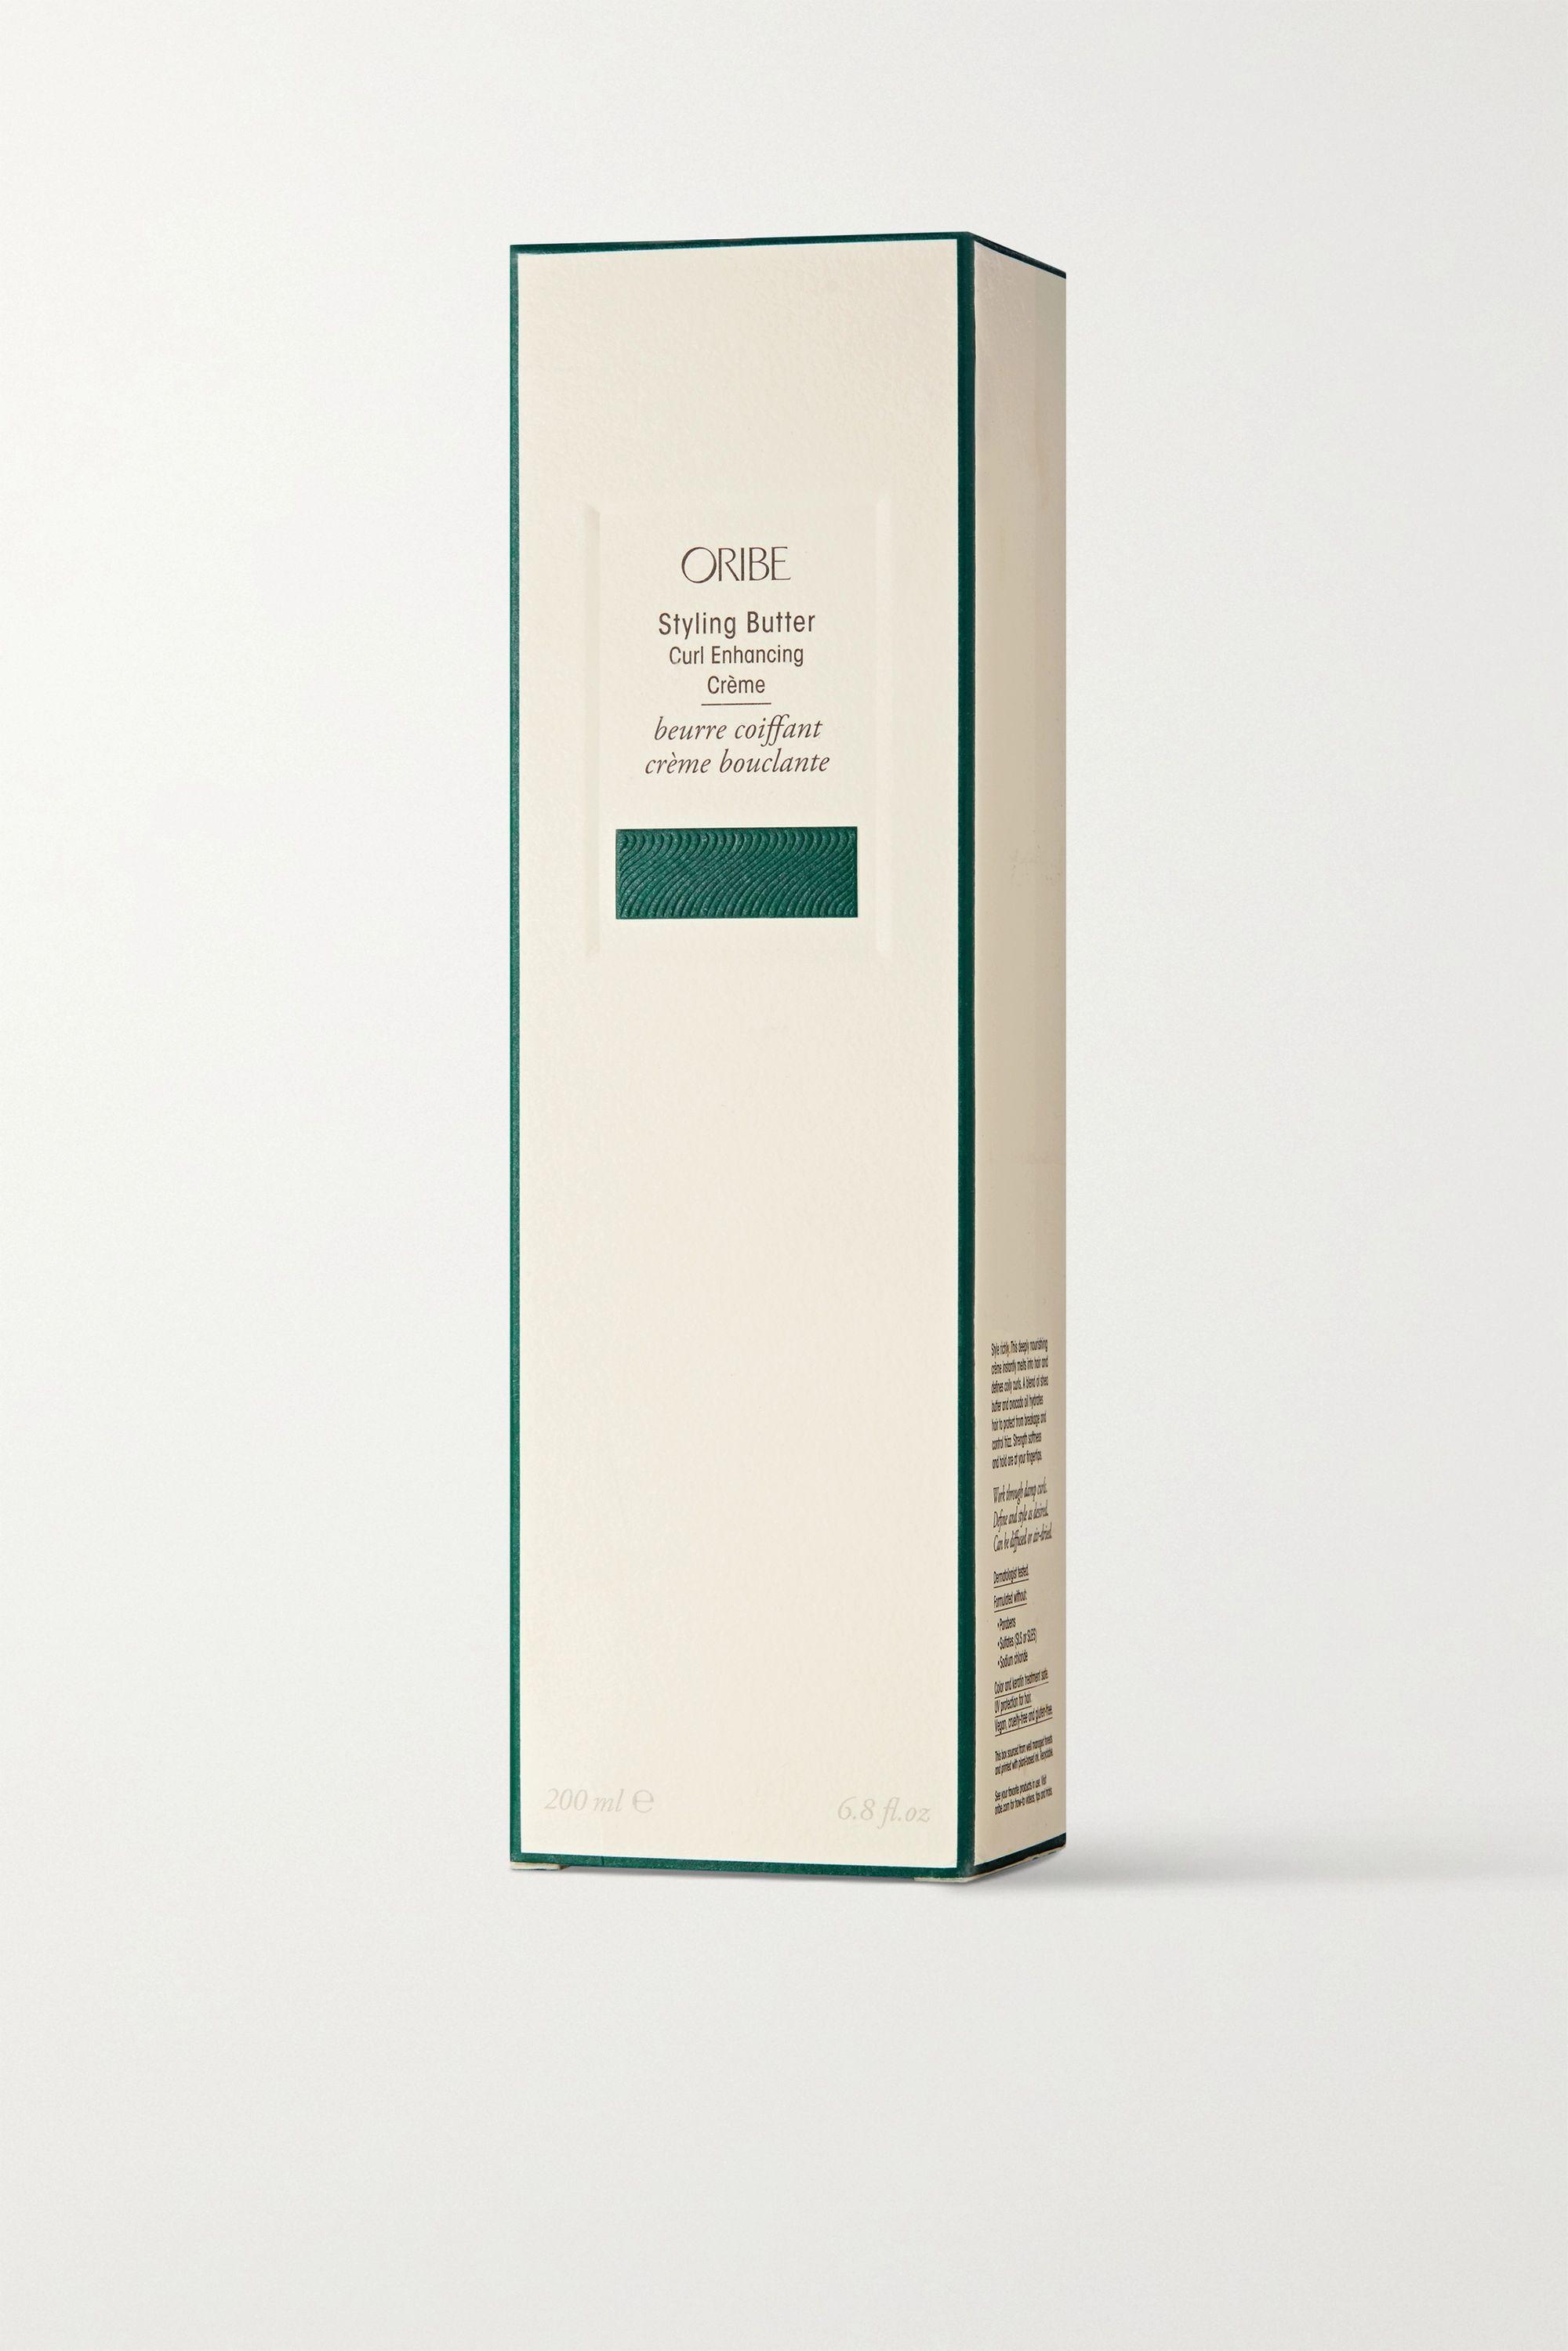 Oribe Styling Butter Curl Enhancing Crème, 200ml